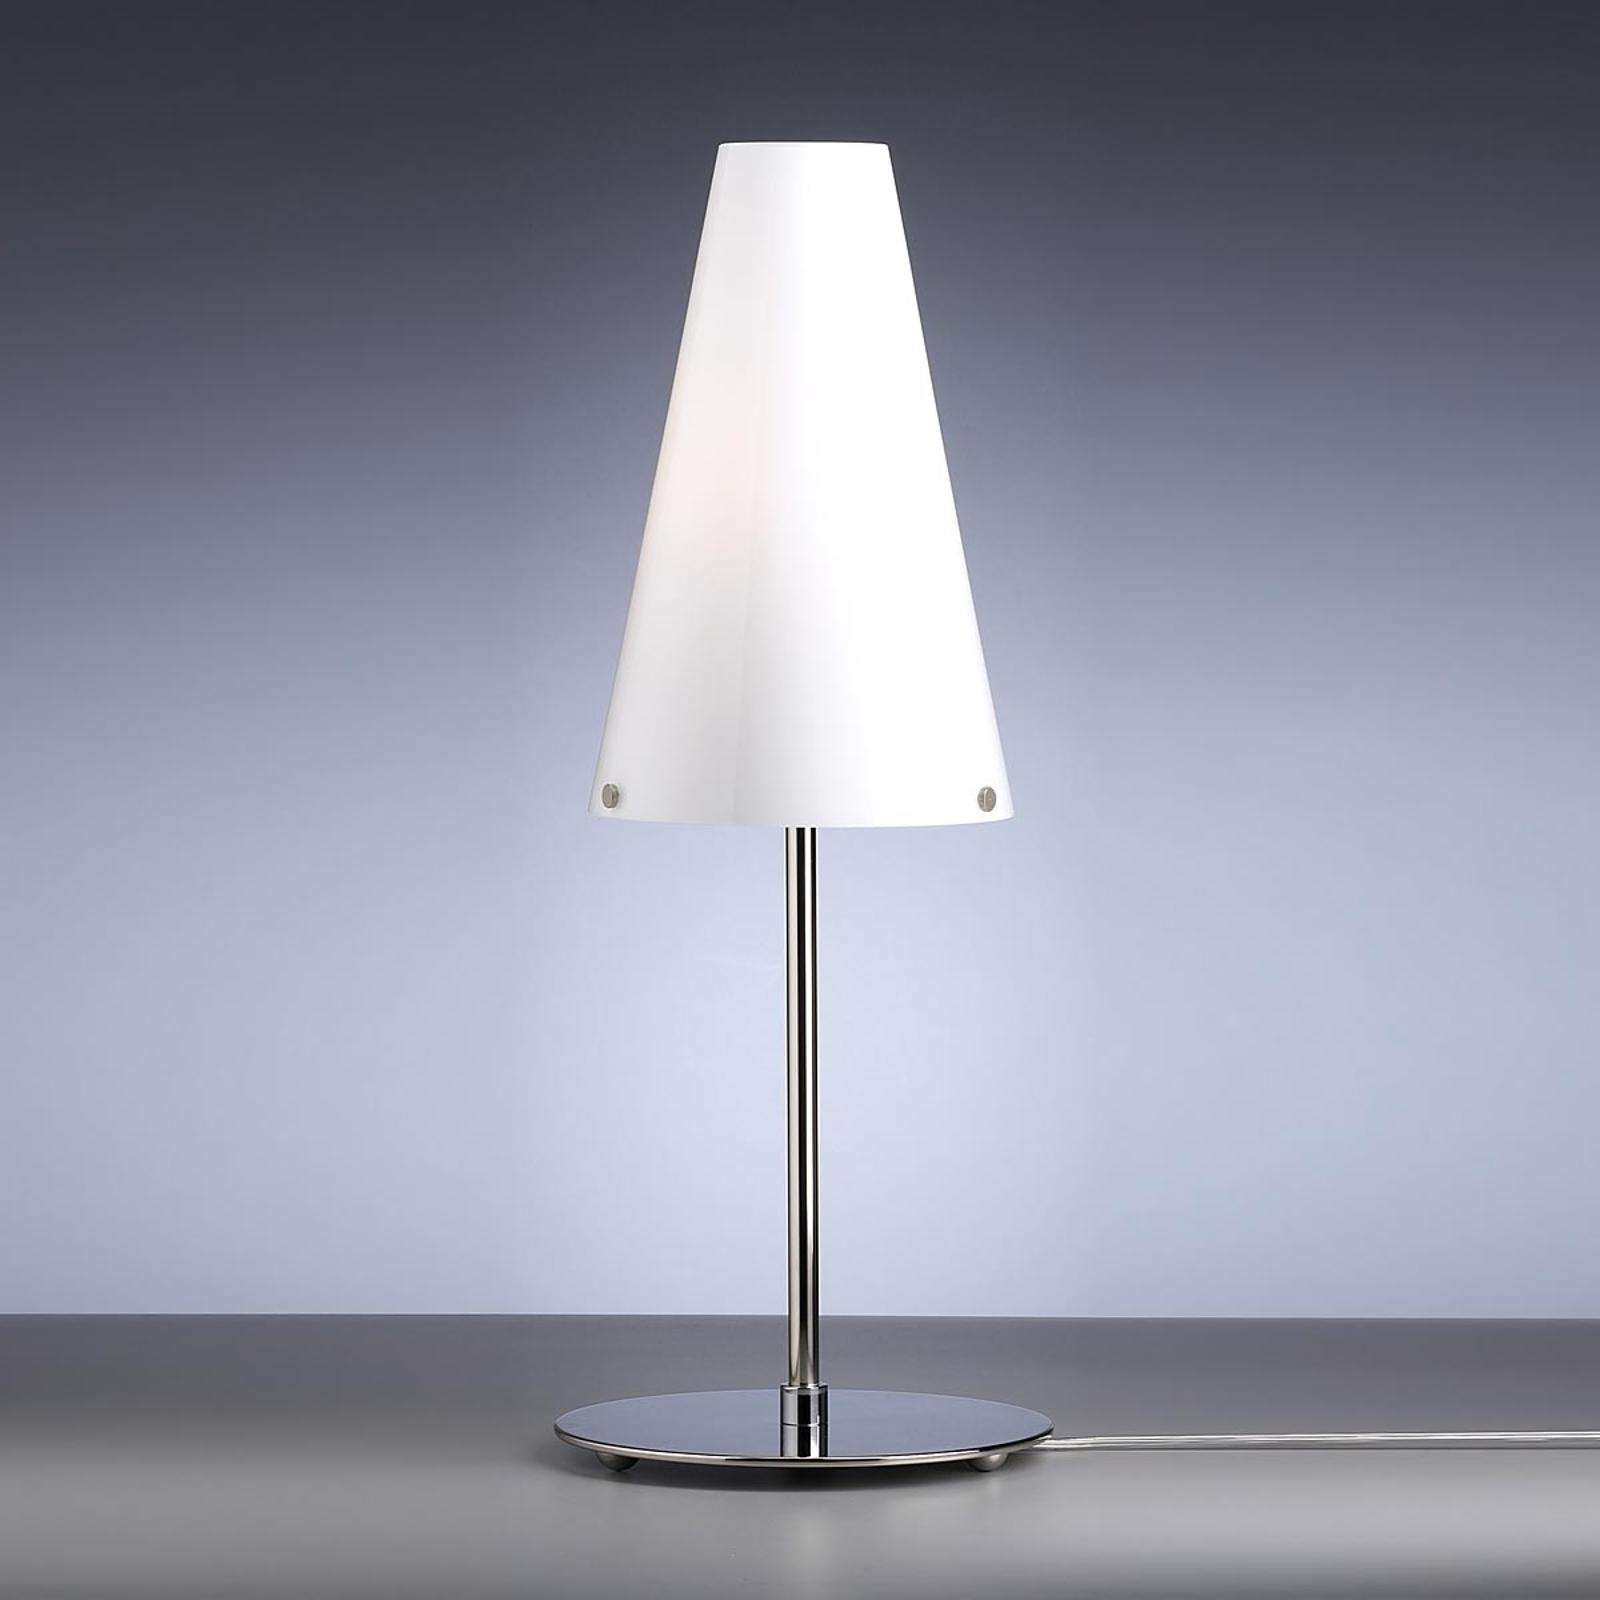 Tafellamp van Walter Schnepel, opaalwit